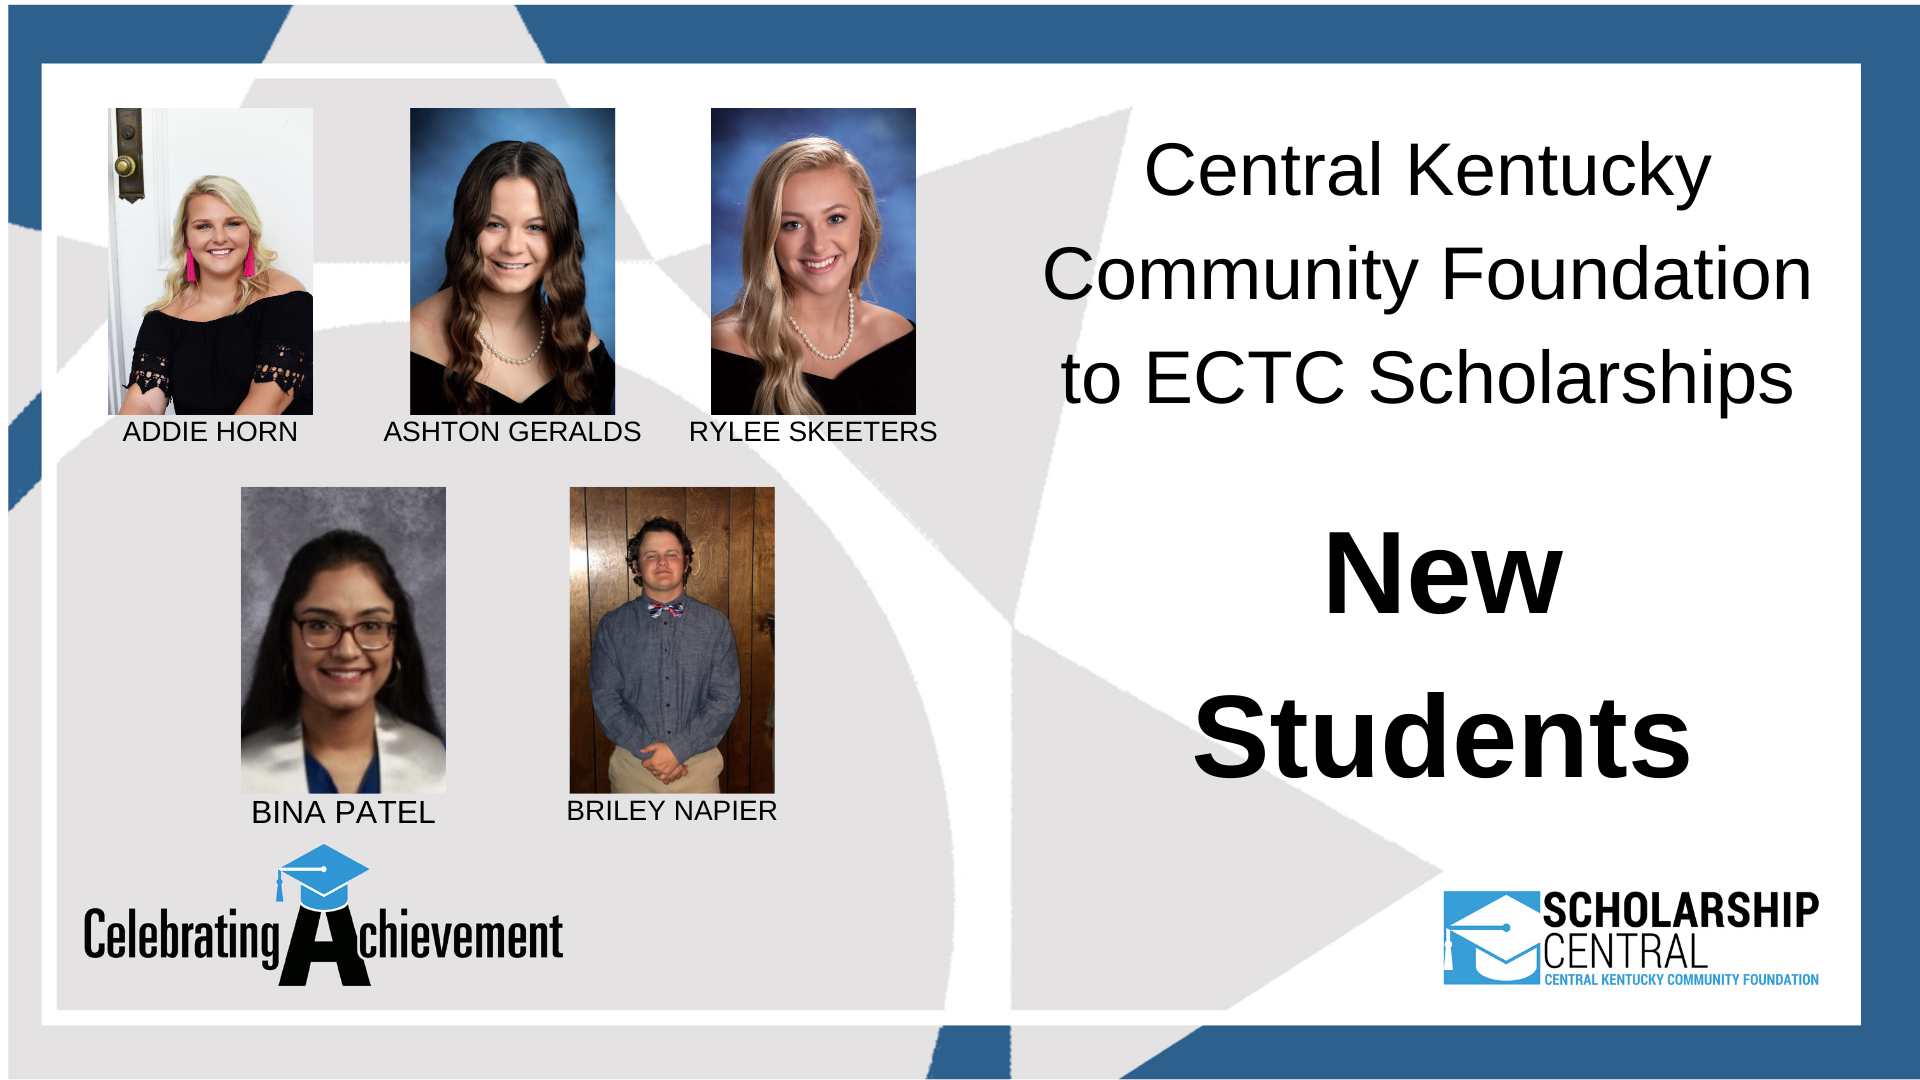 ECTC New Scholarship1